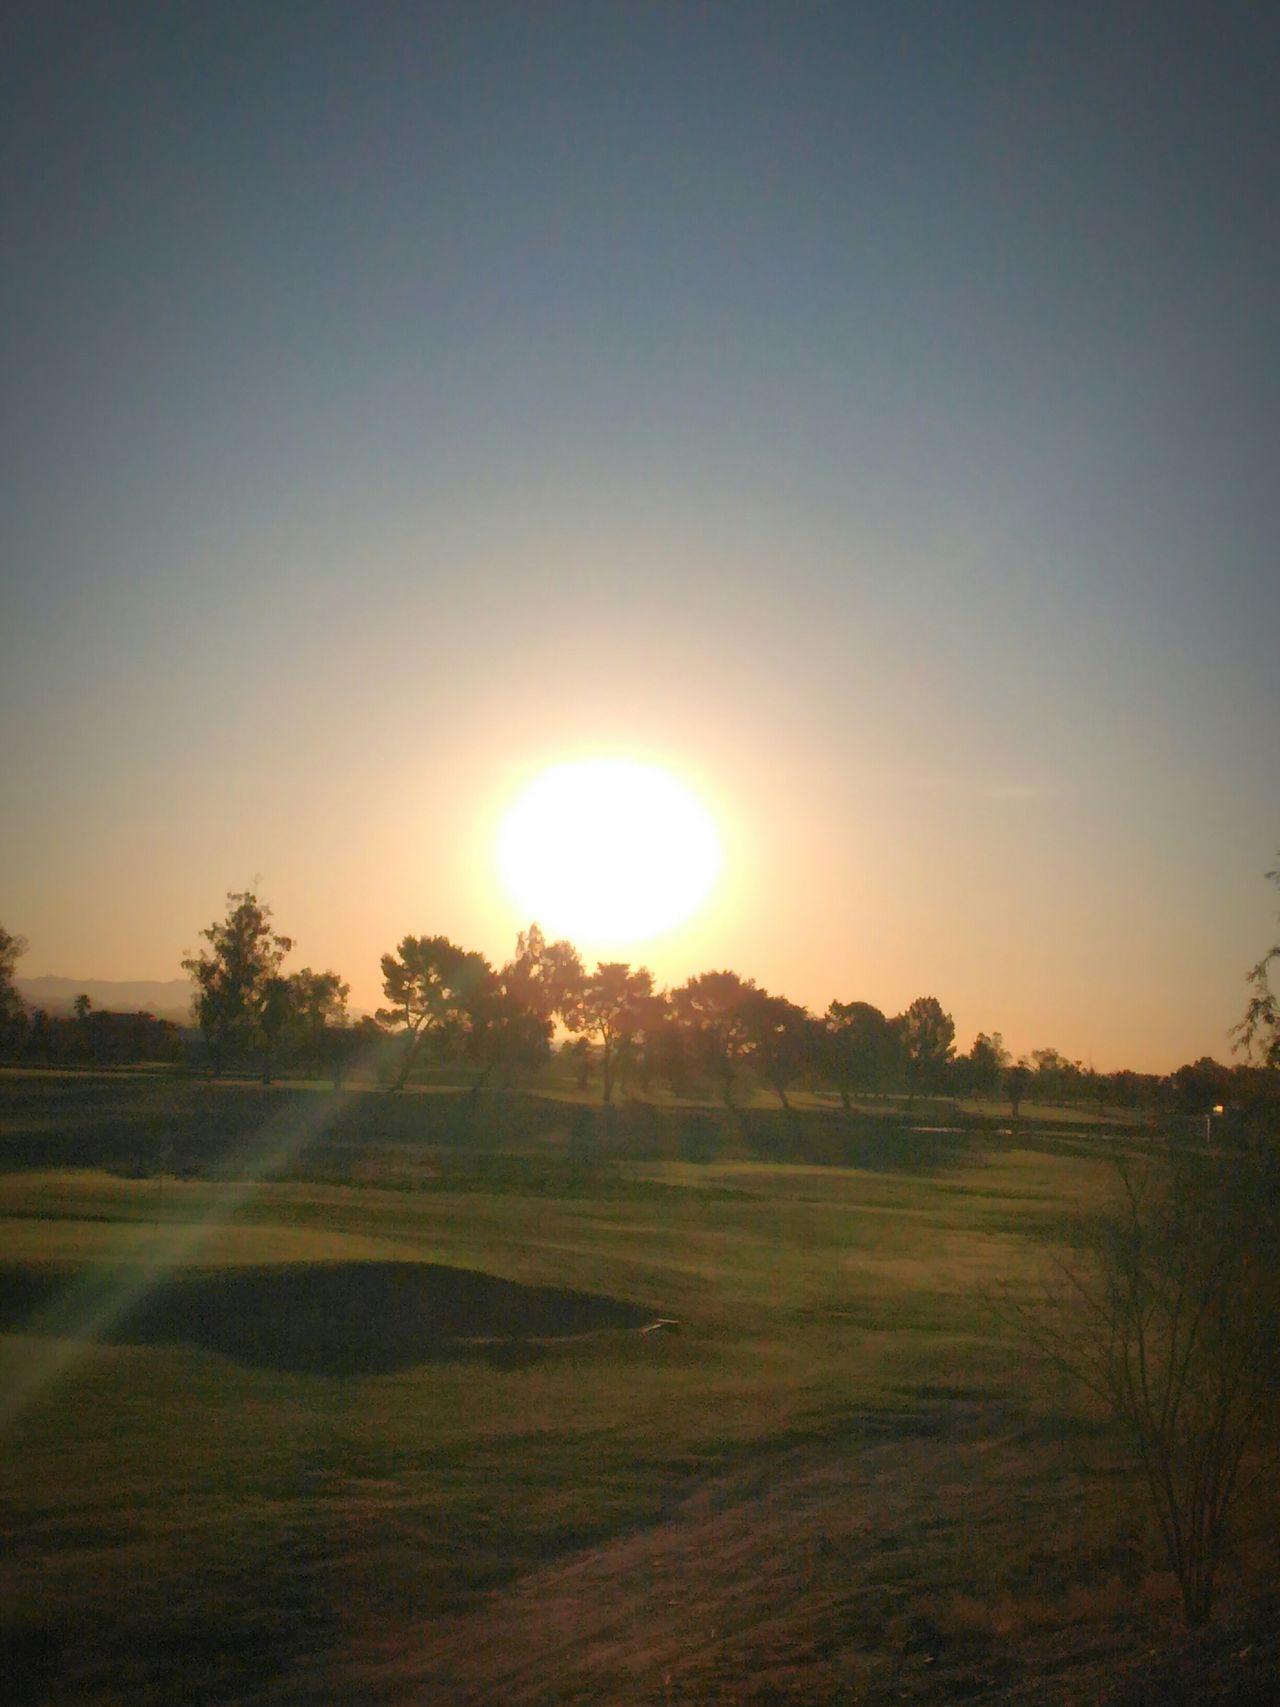 Sunset #sun #clouds #skylovers #sky #nature Beautifulinnature Naturalbeauty Photography Landscape [ [a:554972] Good Night ♡♡ Goodnight EyeEm Good Night Sunsetporn Sunshine Sunset Sunset #sun #clouds #skylovers #sky #nature #beautifulinnature #naturalbeauty Ph Otography LandscapeSun_collection, Sky_collection, Cloudporn, Skyporn Sunset Silhouettes Golf Course Golfcourse Golf ⛳ Golf